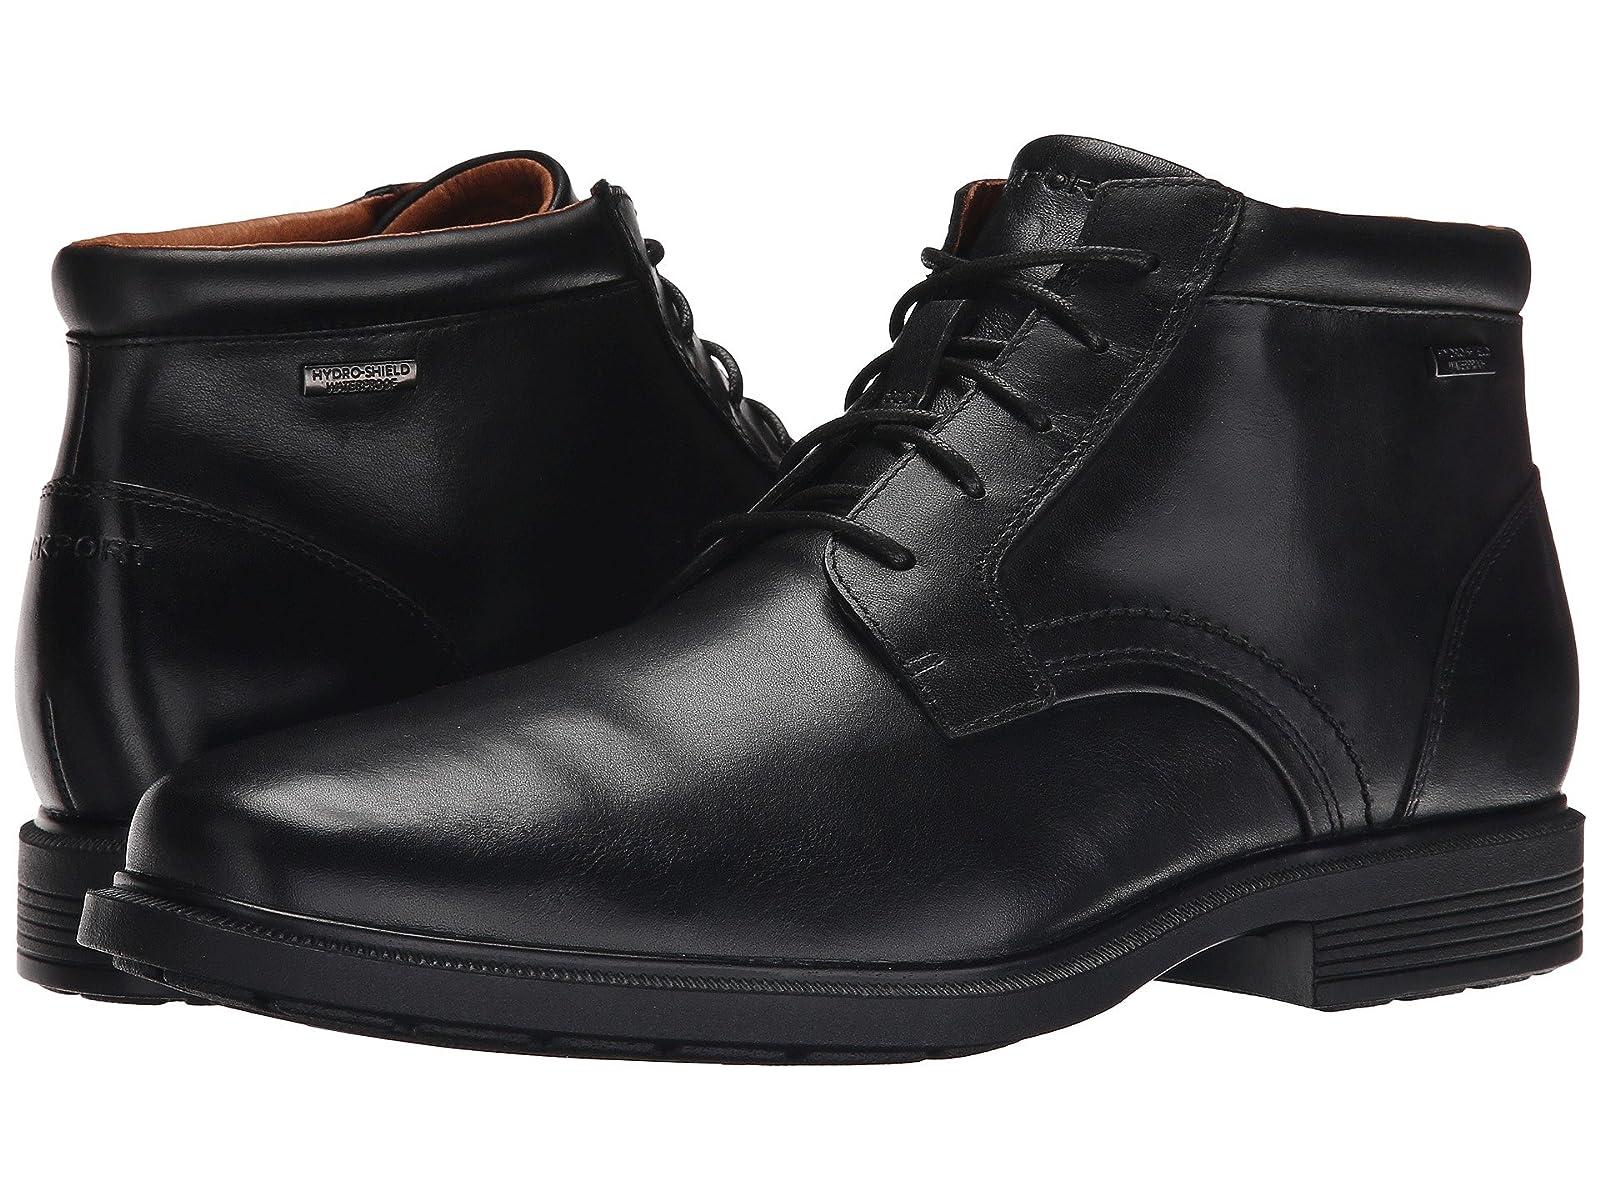 Rockport Dressports Luxe Waterproof ChukkaCheap and distinctive eye-catching shoes